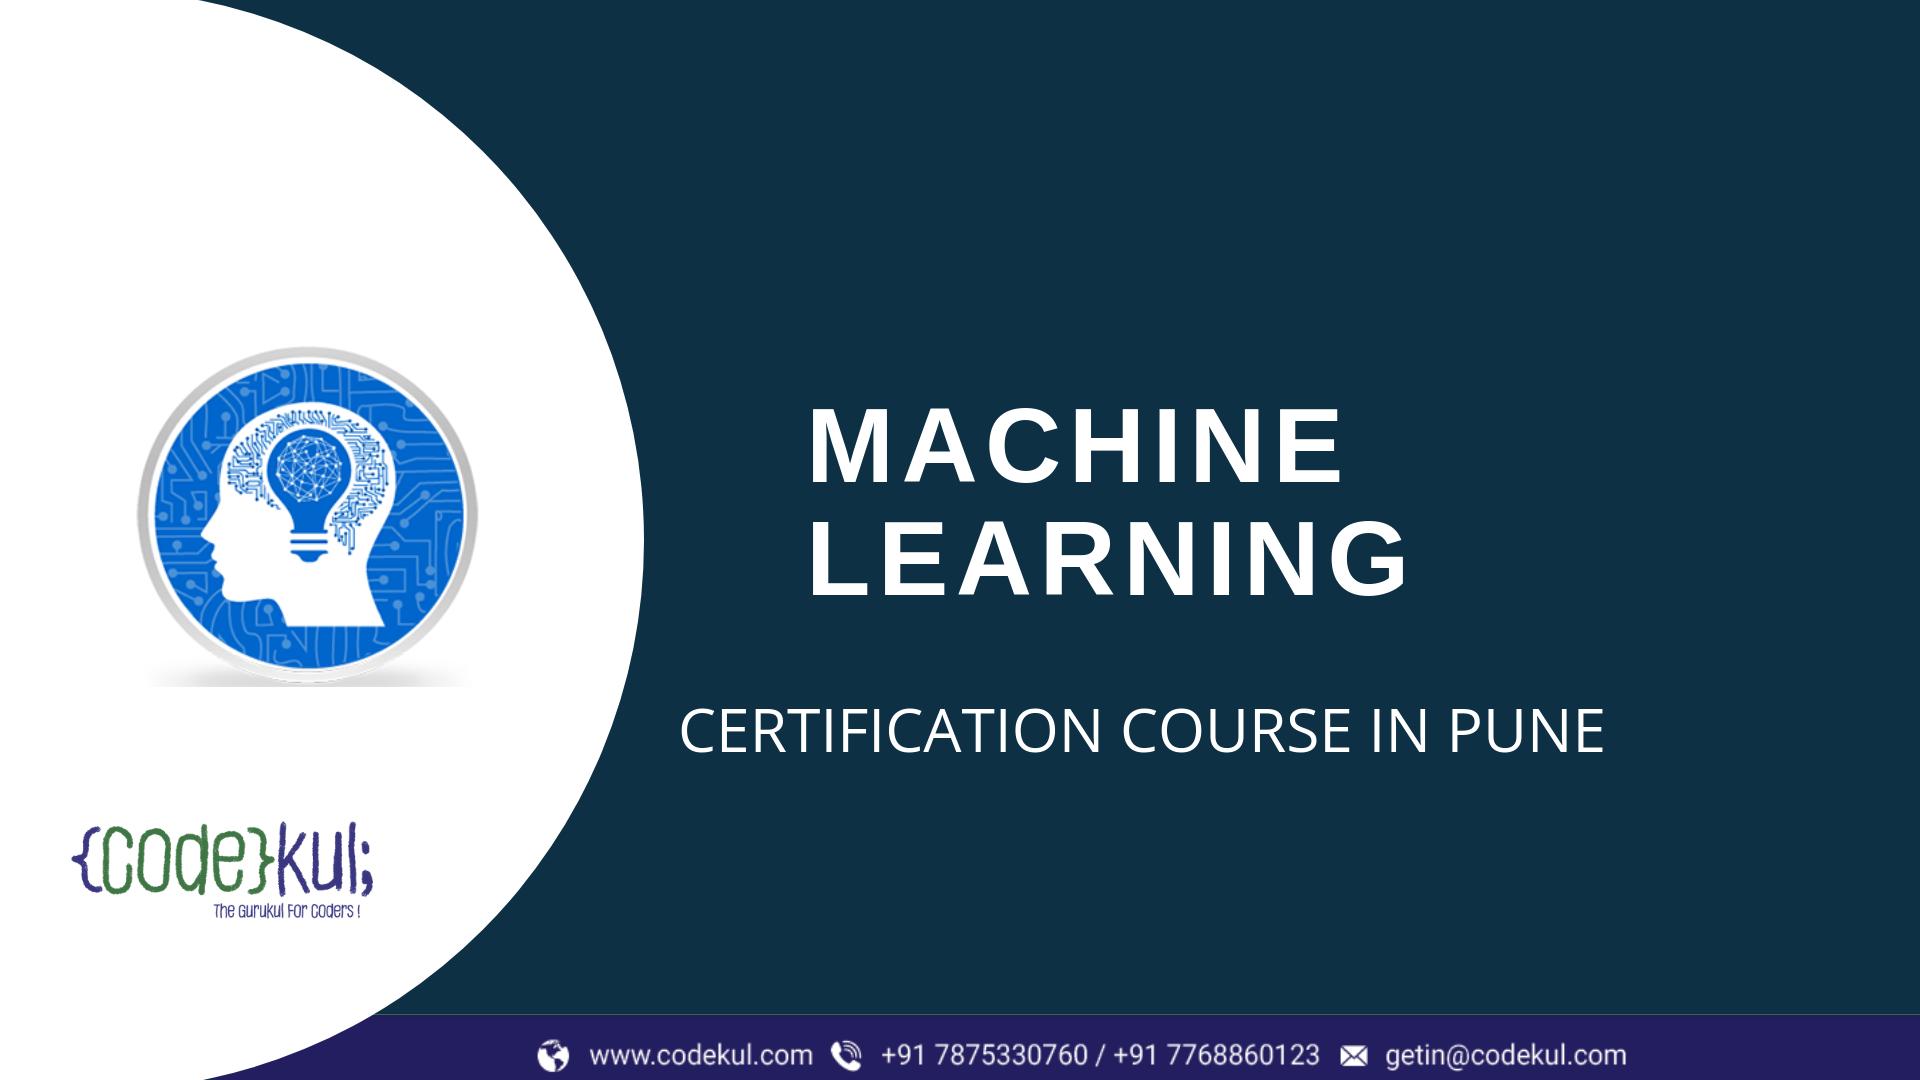 Machine Learning Openings In Pune - Quantum Computing